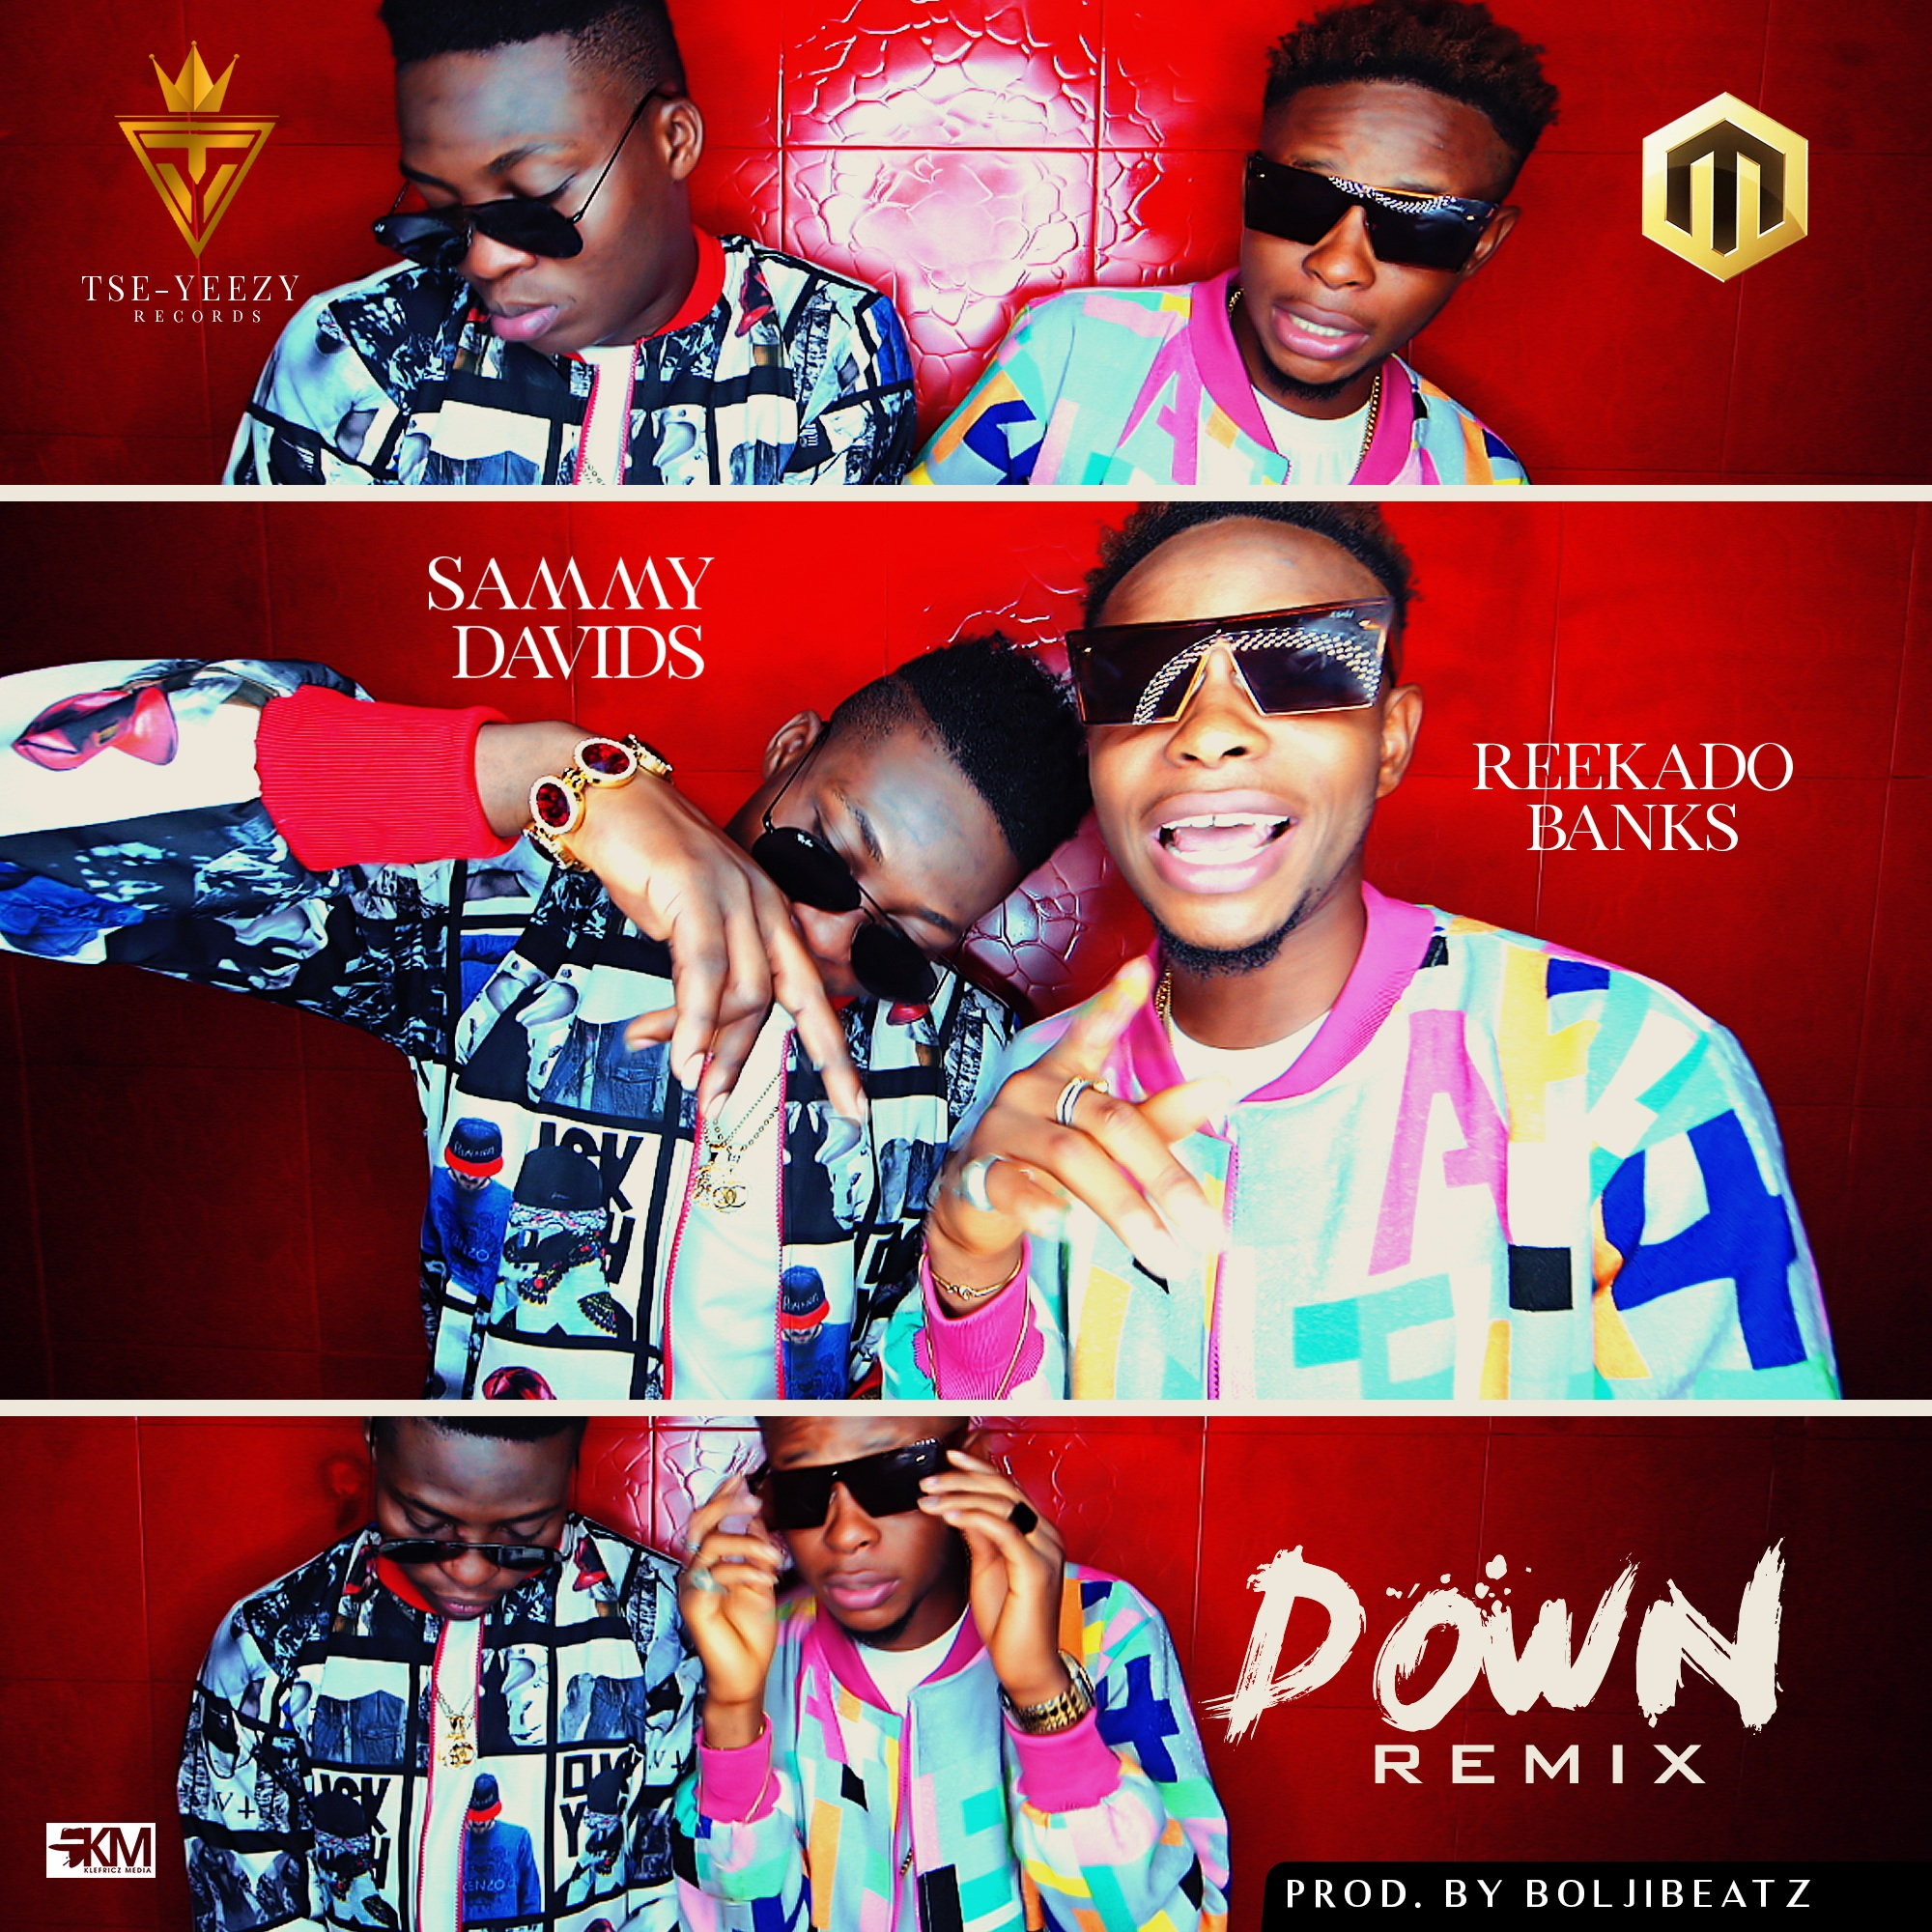 VIDEO: Sammy Davids ft. Reekado Banks - Down (Remix)